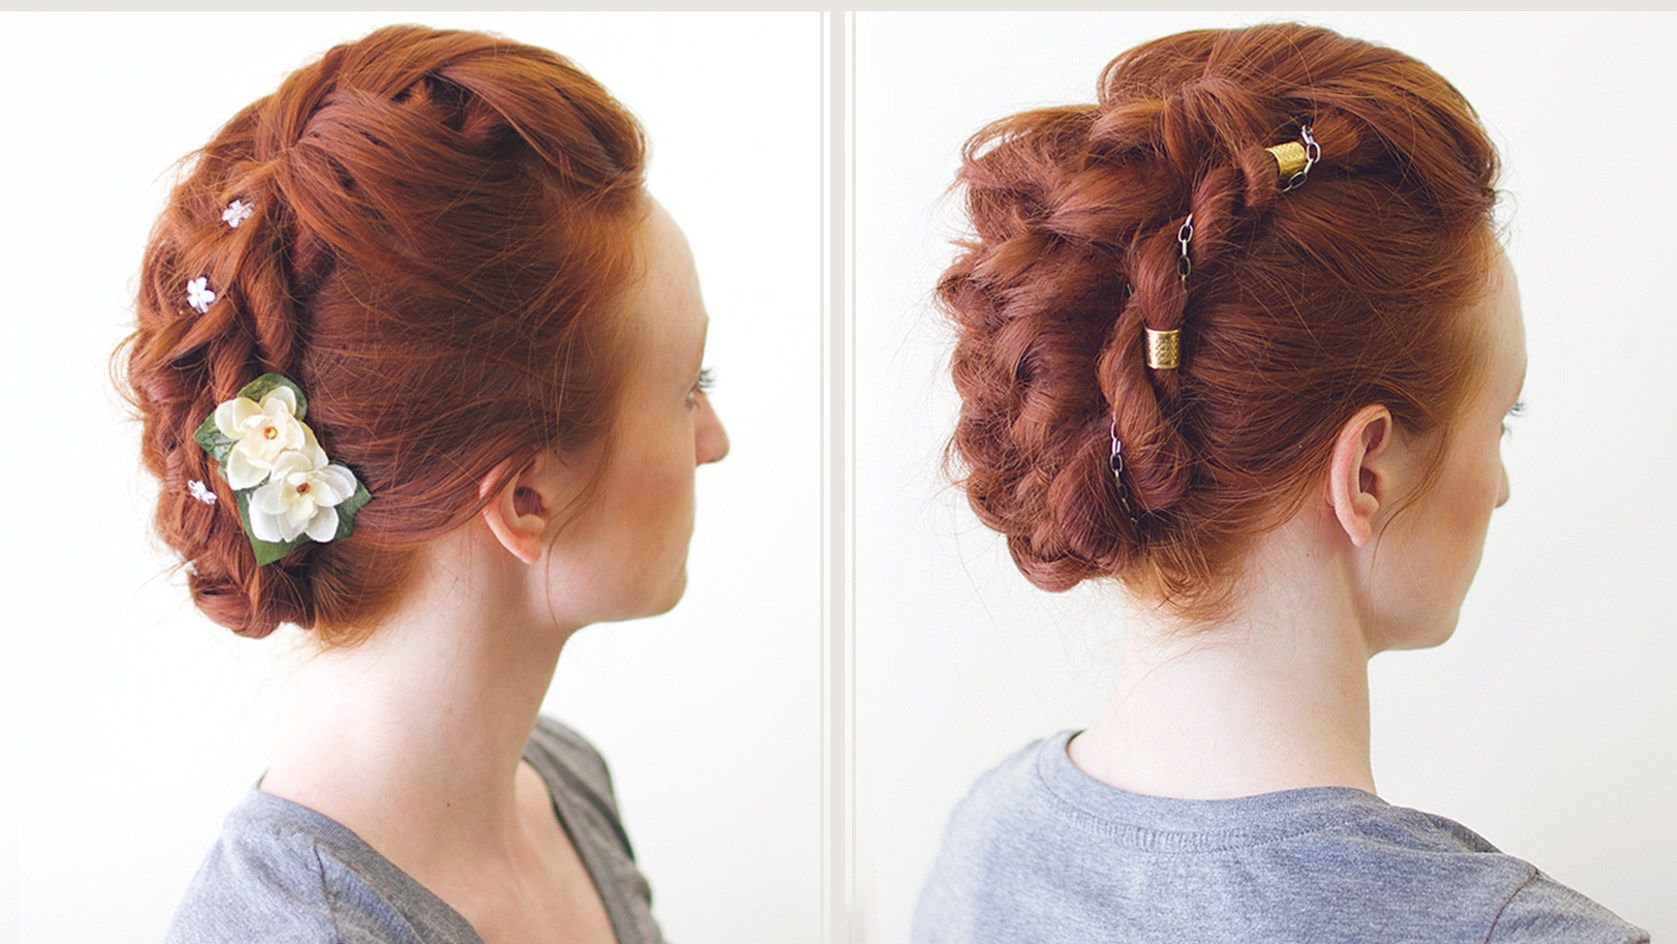 Versatile braid mohawk hairstyle primp style strut beauty